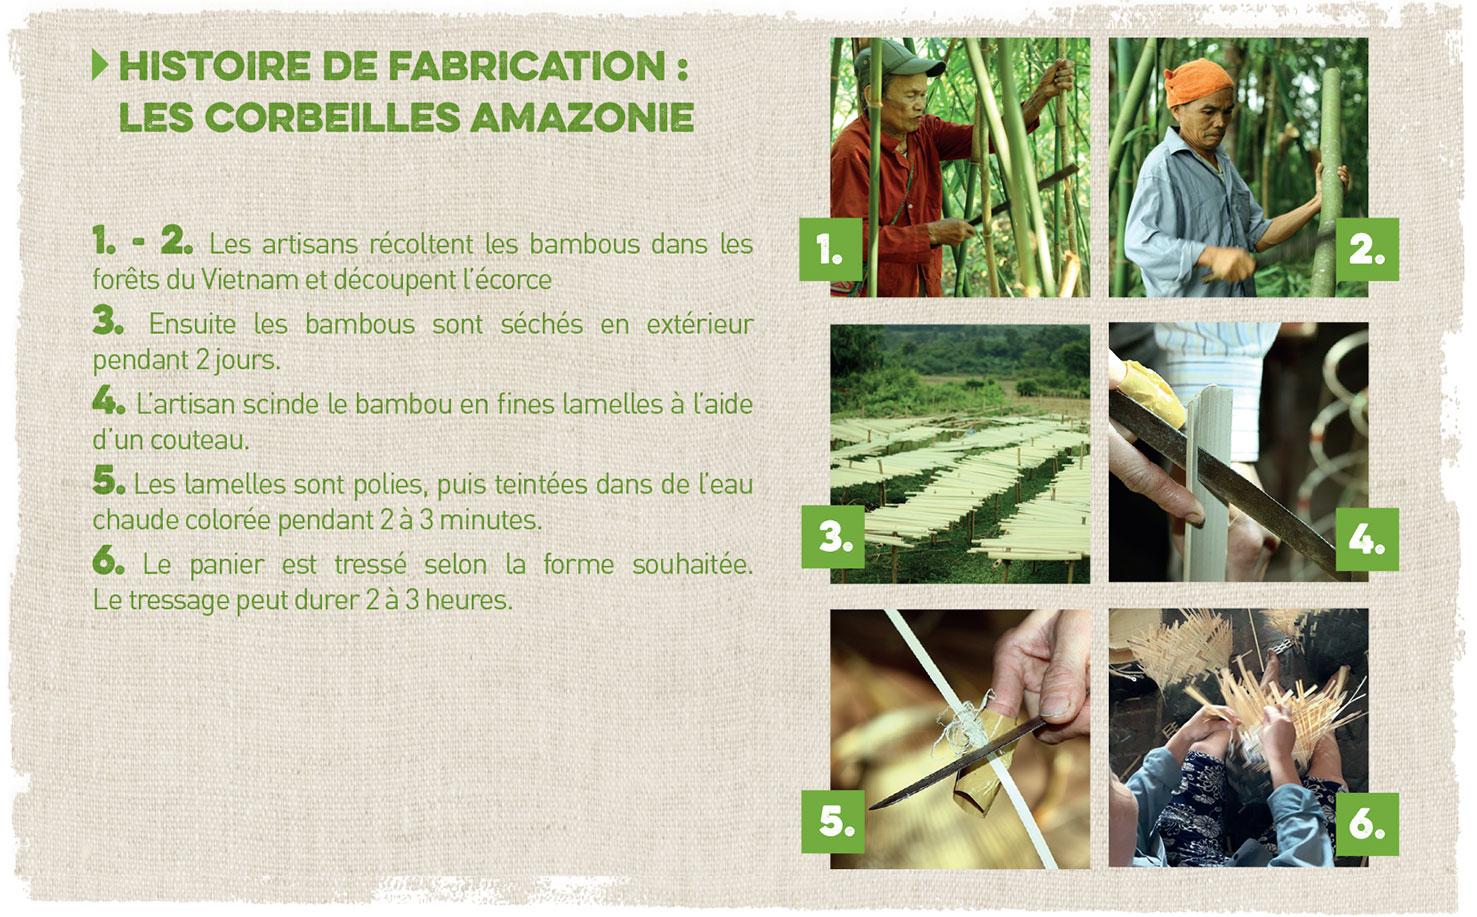 fabrication de la corbeille en bambou